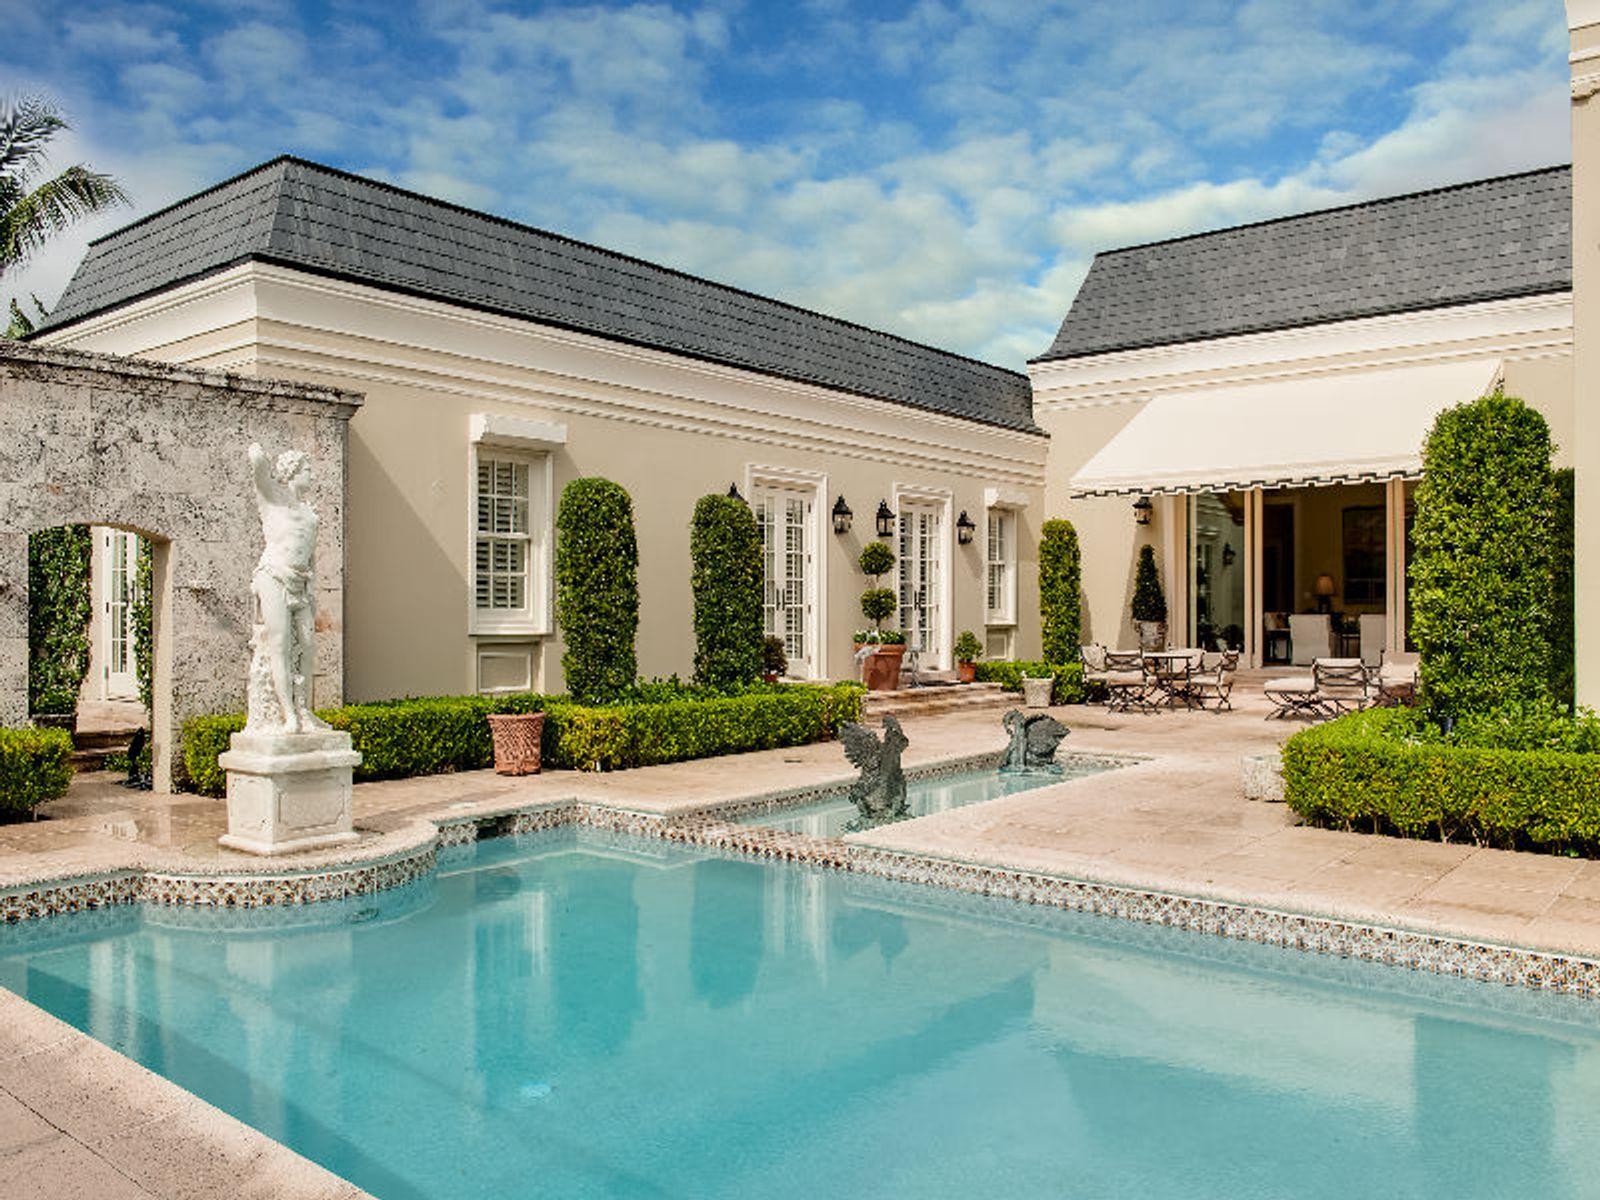 Sophisticated Casa Bendita